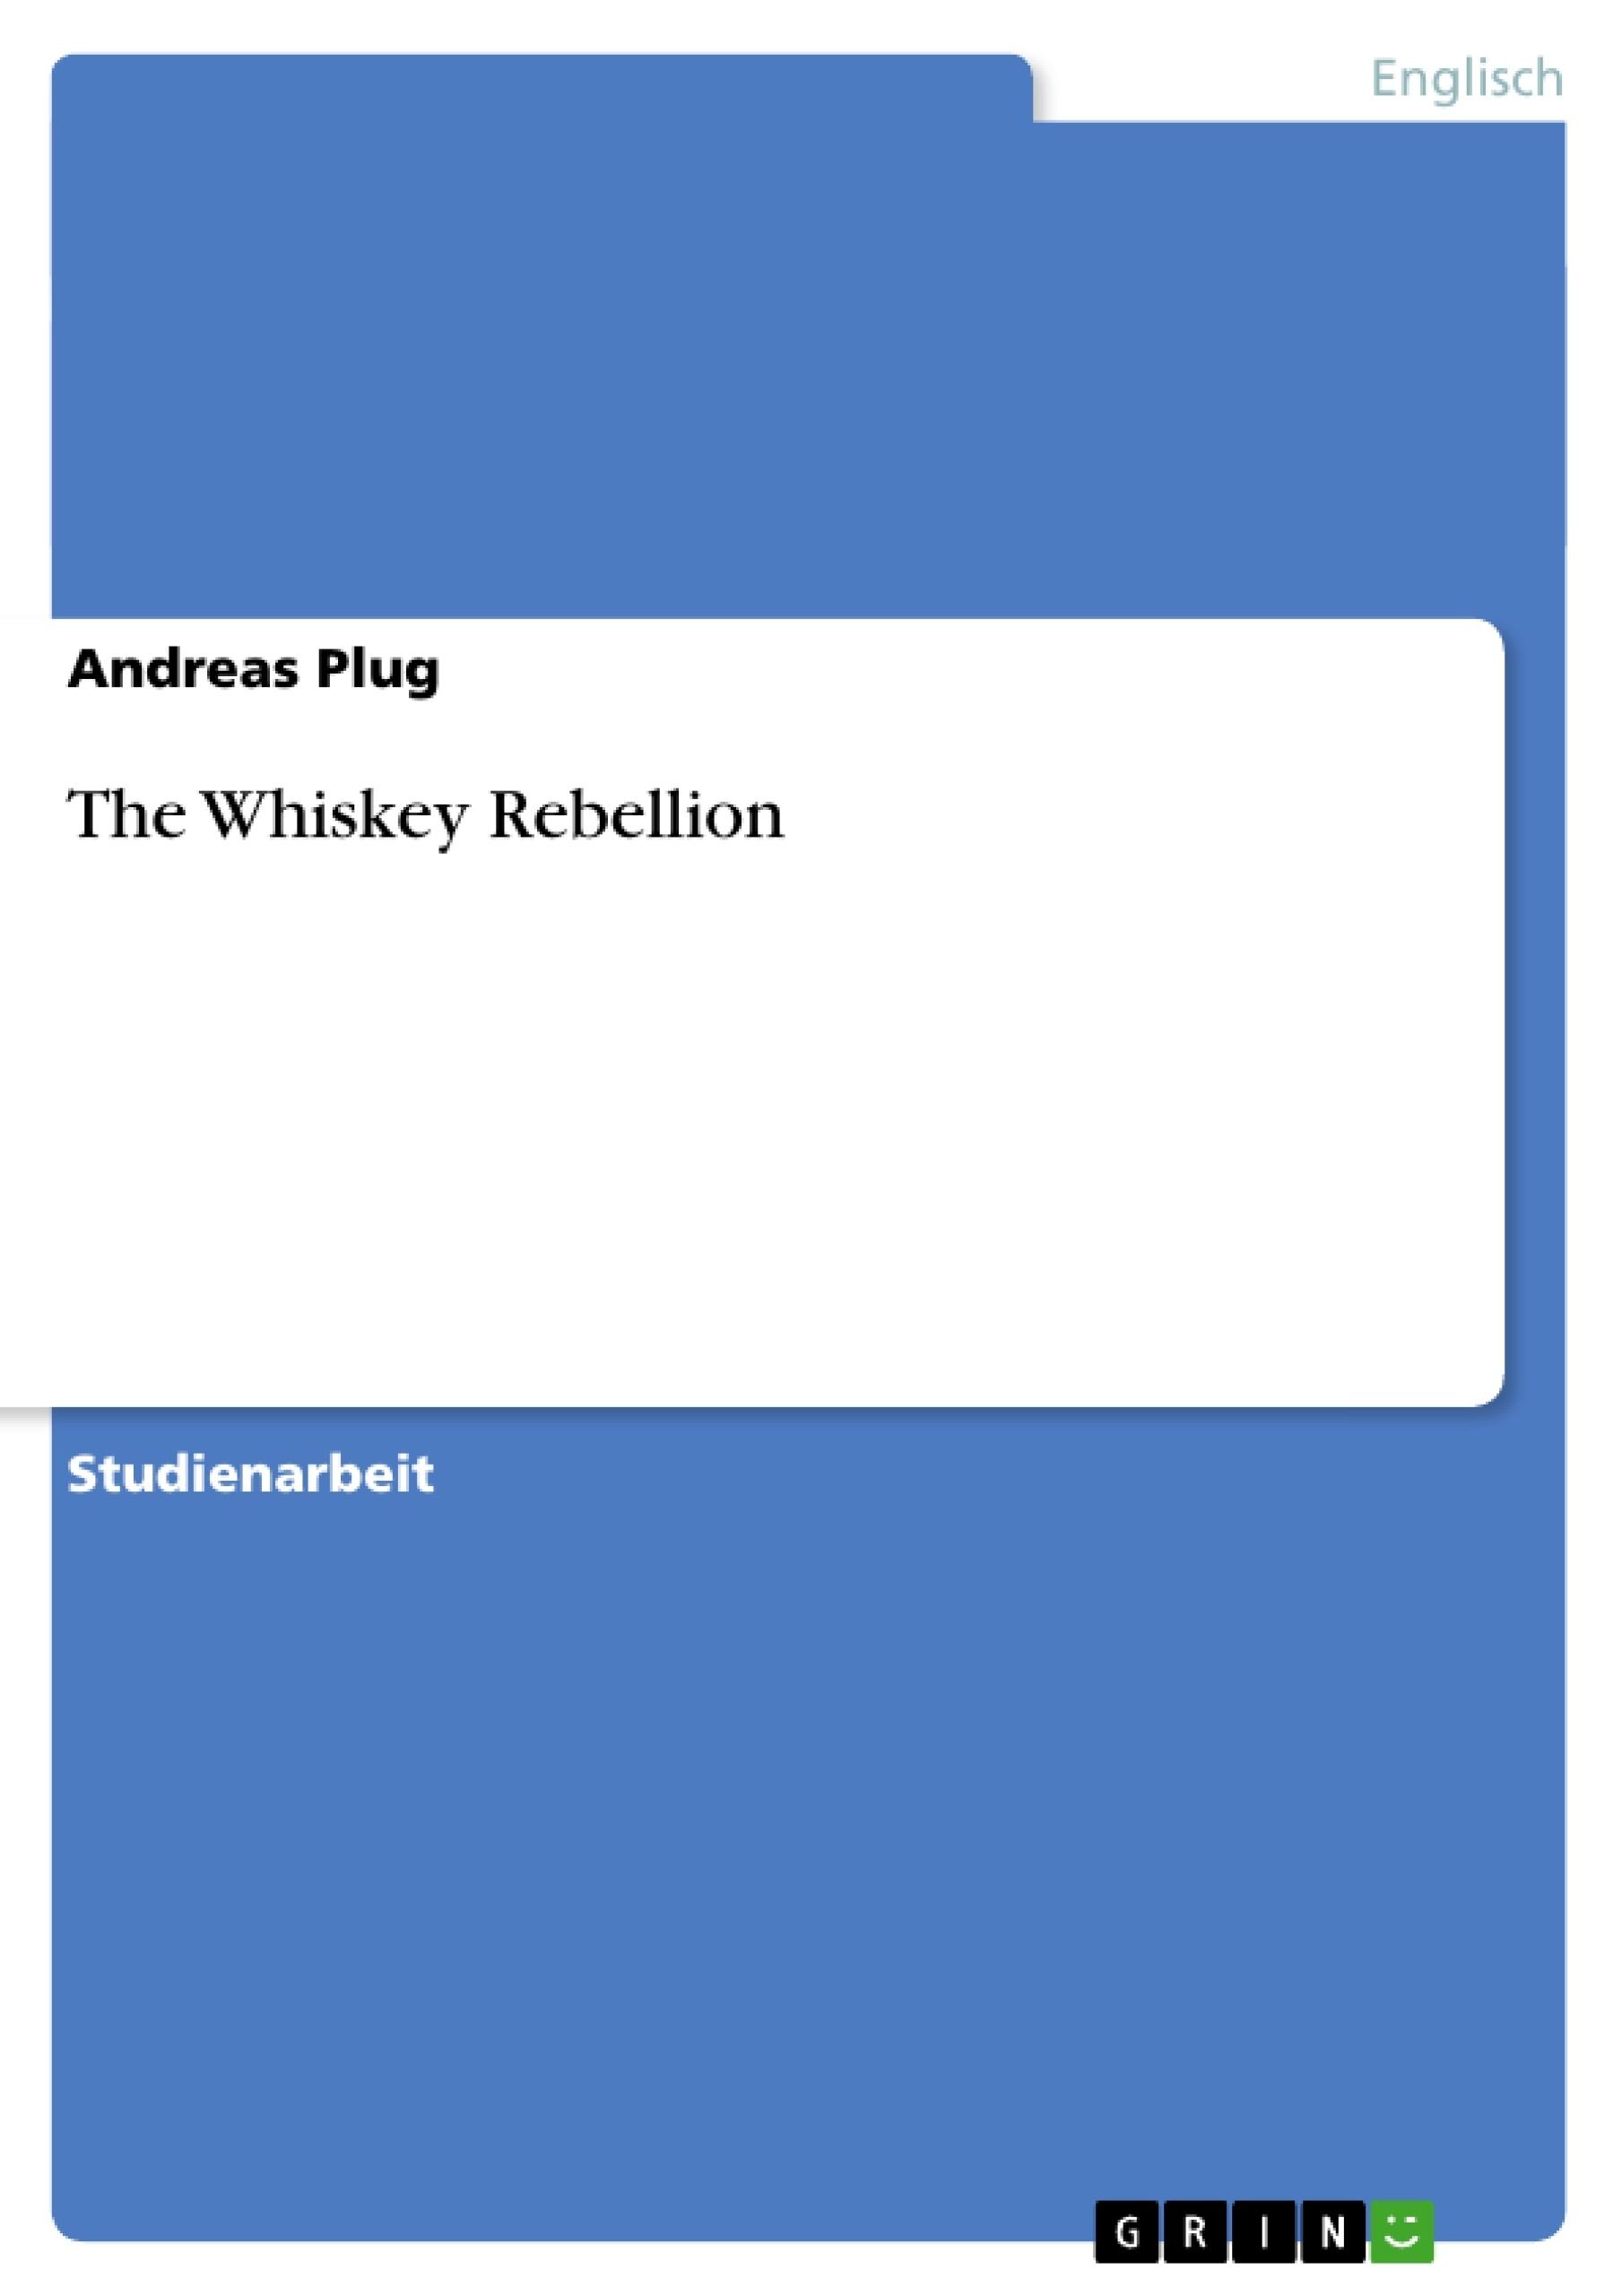 Titel: The Whiskey Rebellion